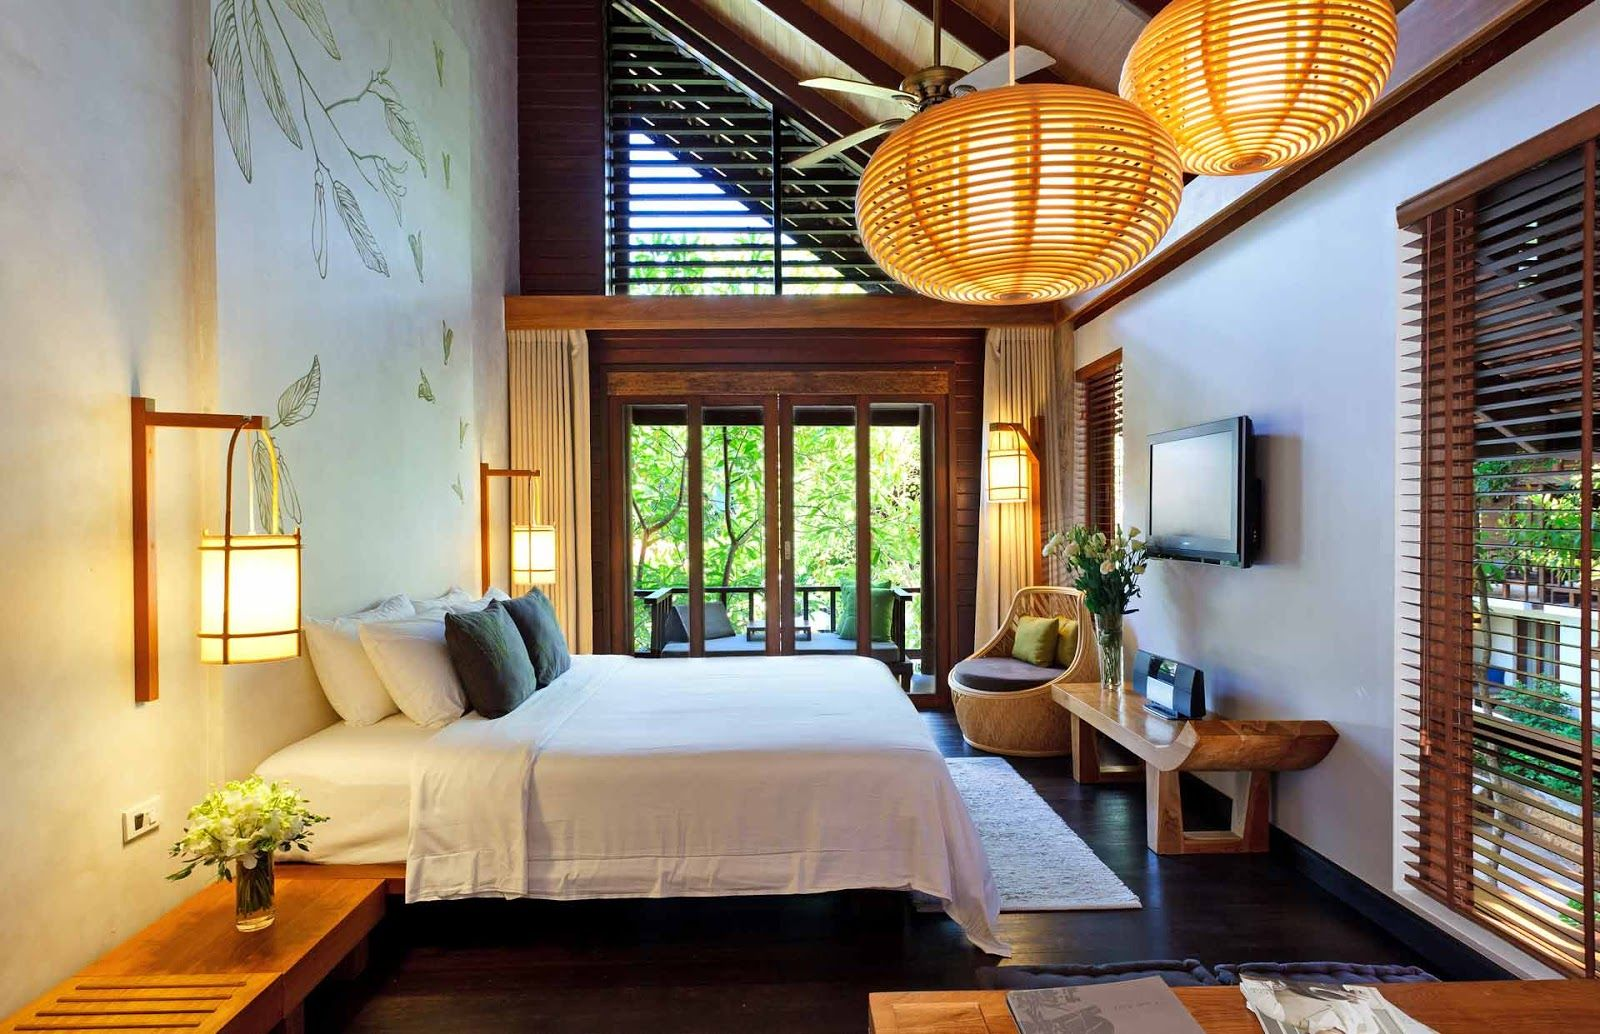 Cottages amp campground rentals riverview cottages campground jackman - Krabi Hotel The Tubkaak Krabi Is A Boutique Villa Resort Thailand